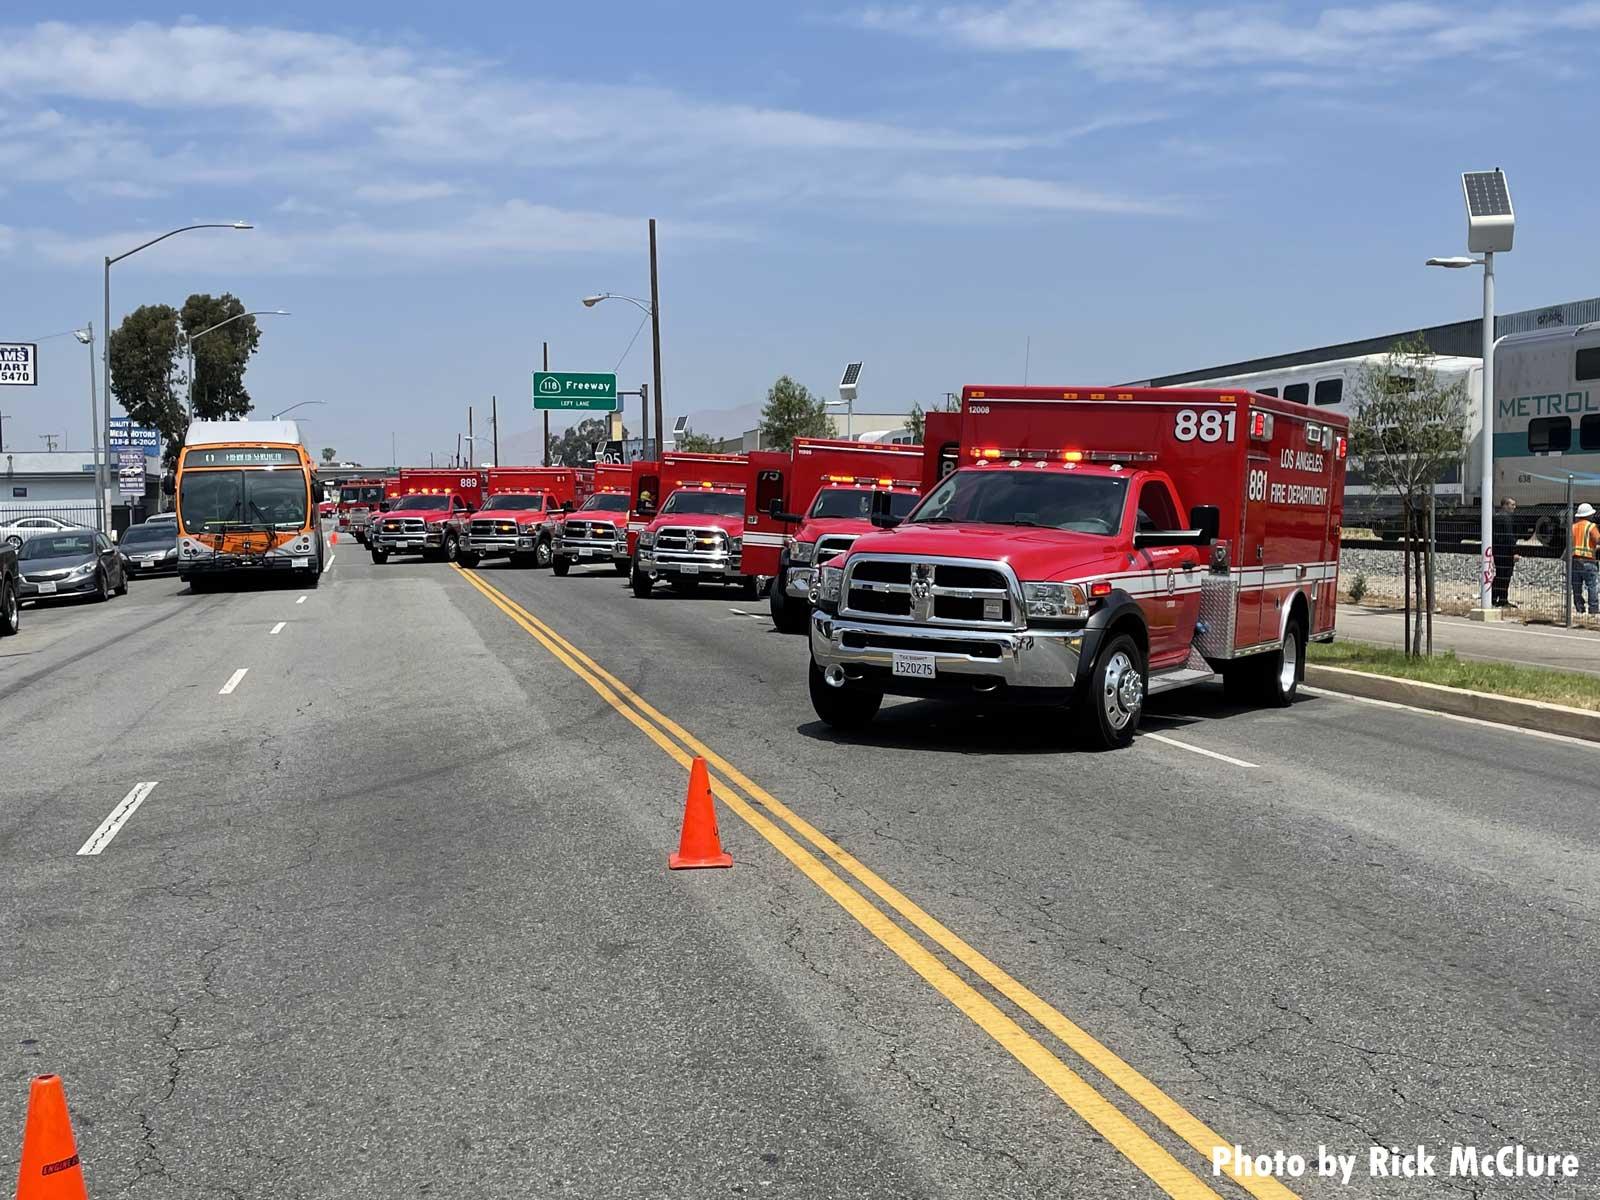 Multiple LAFD ambulances at scene